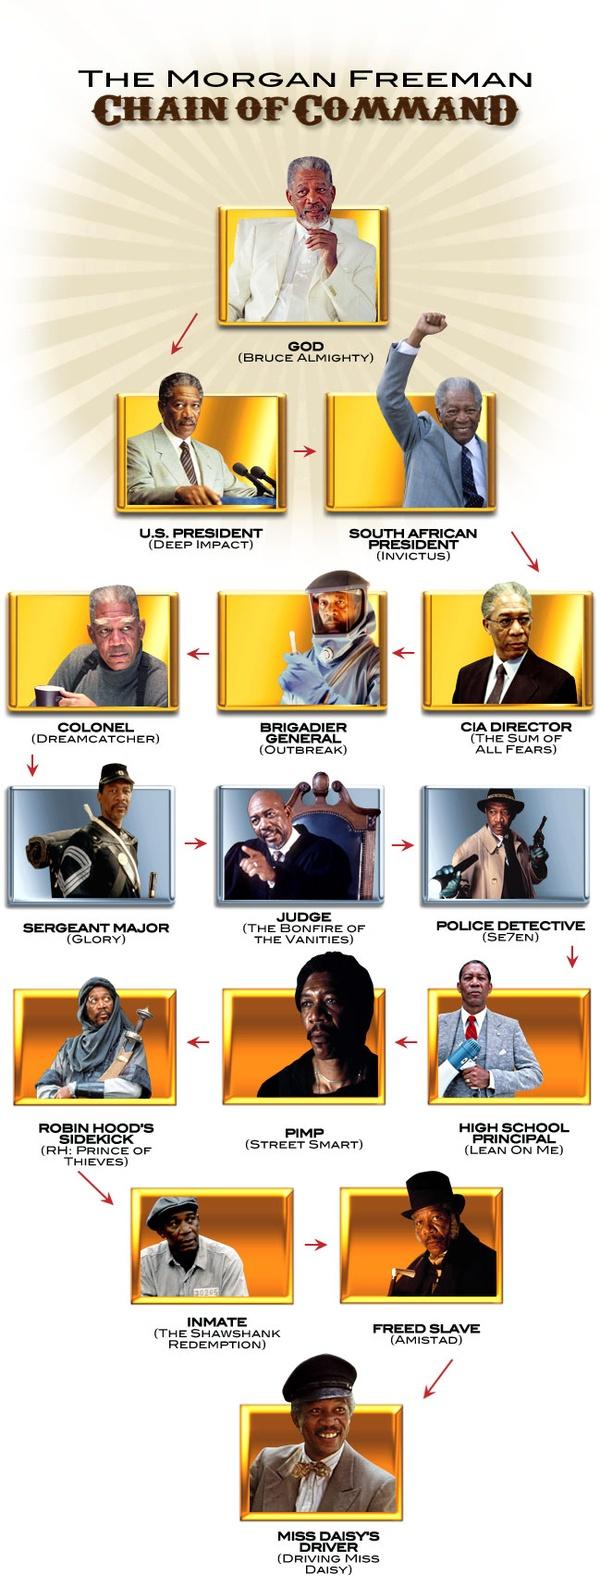 Morgan Freeman chain of command